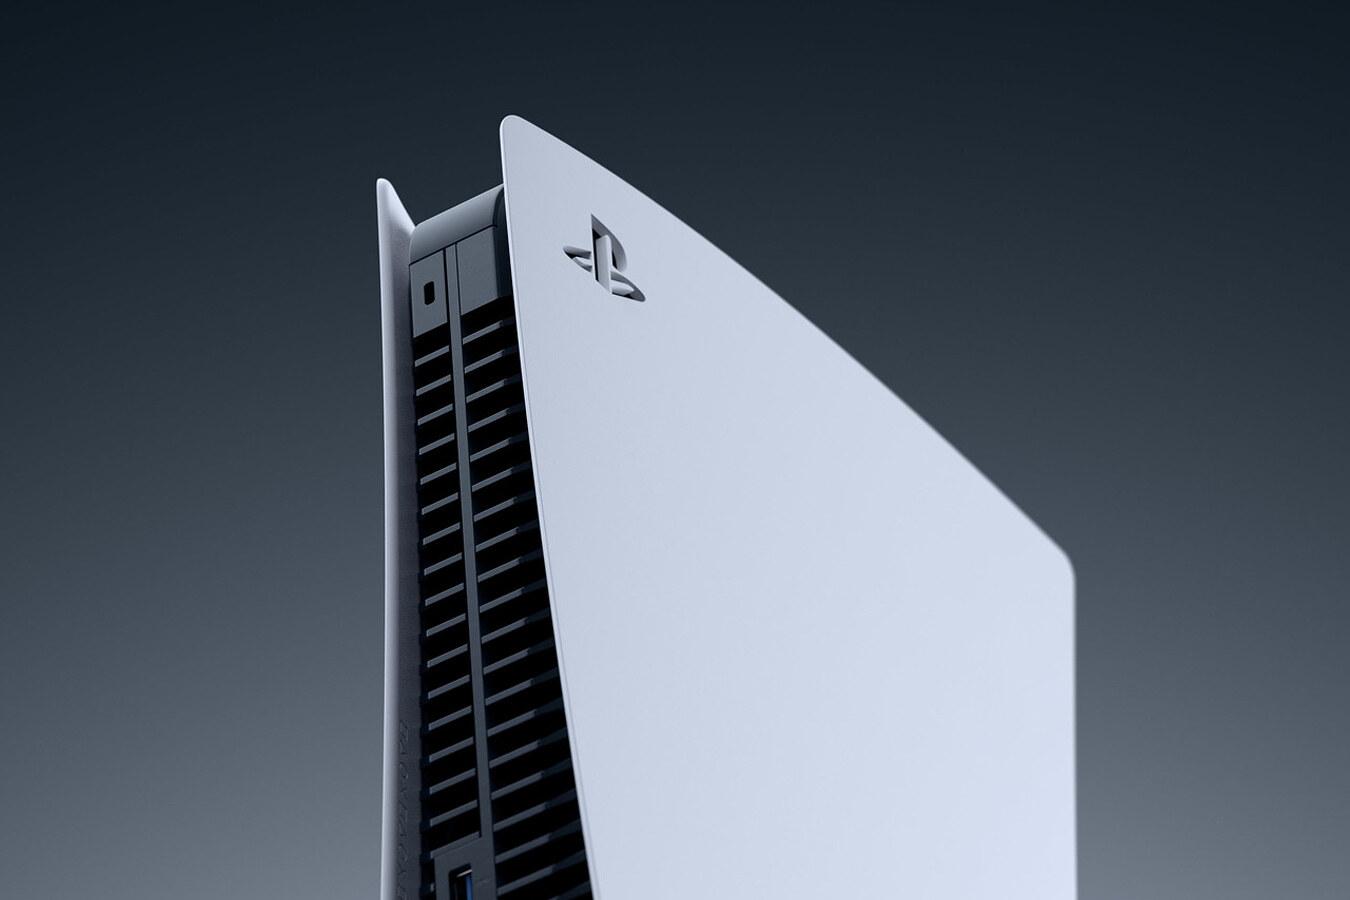 PlayStation 5 Zoom hi-res